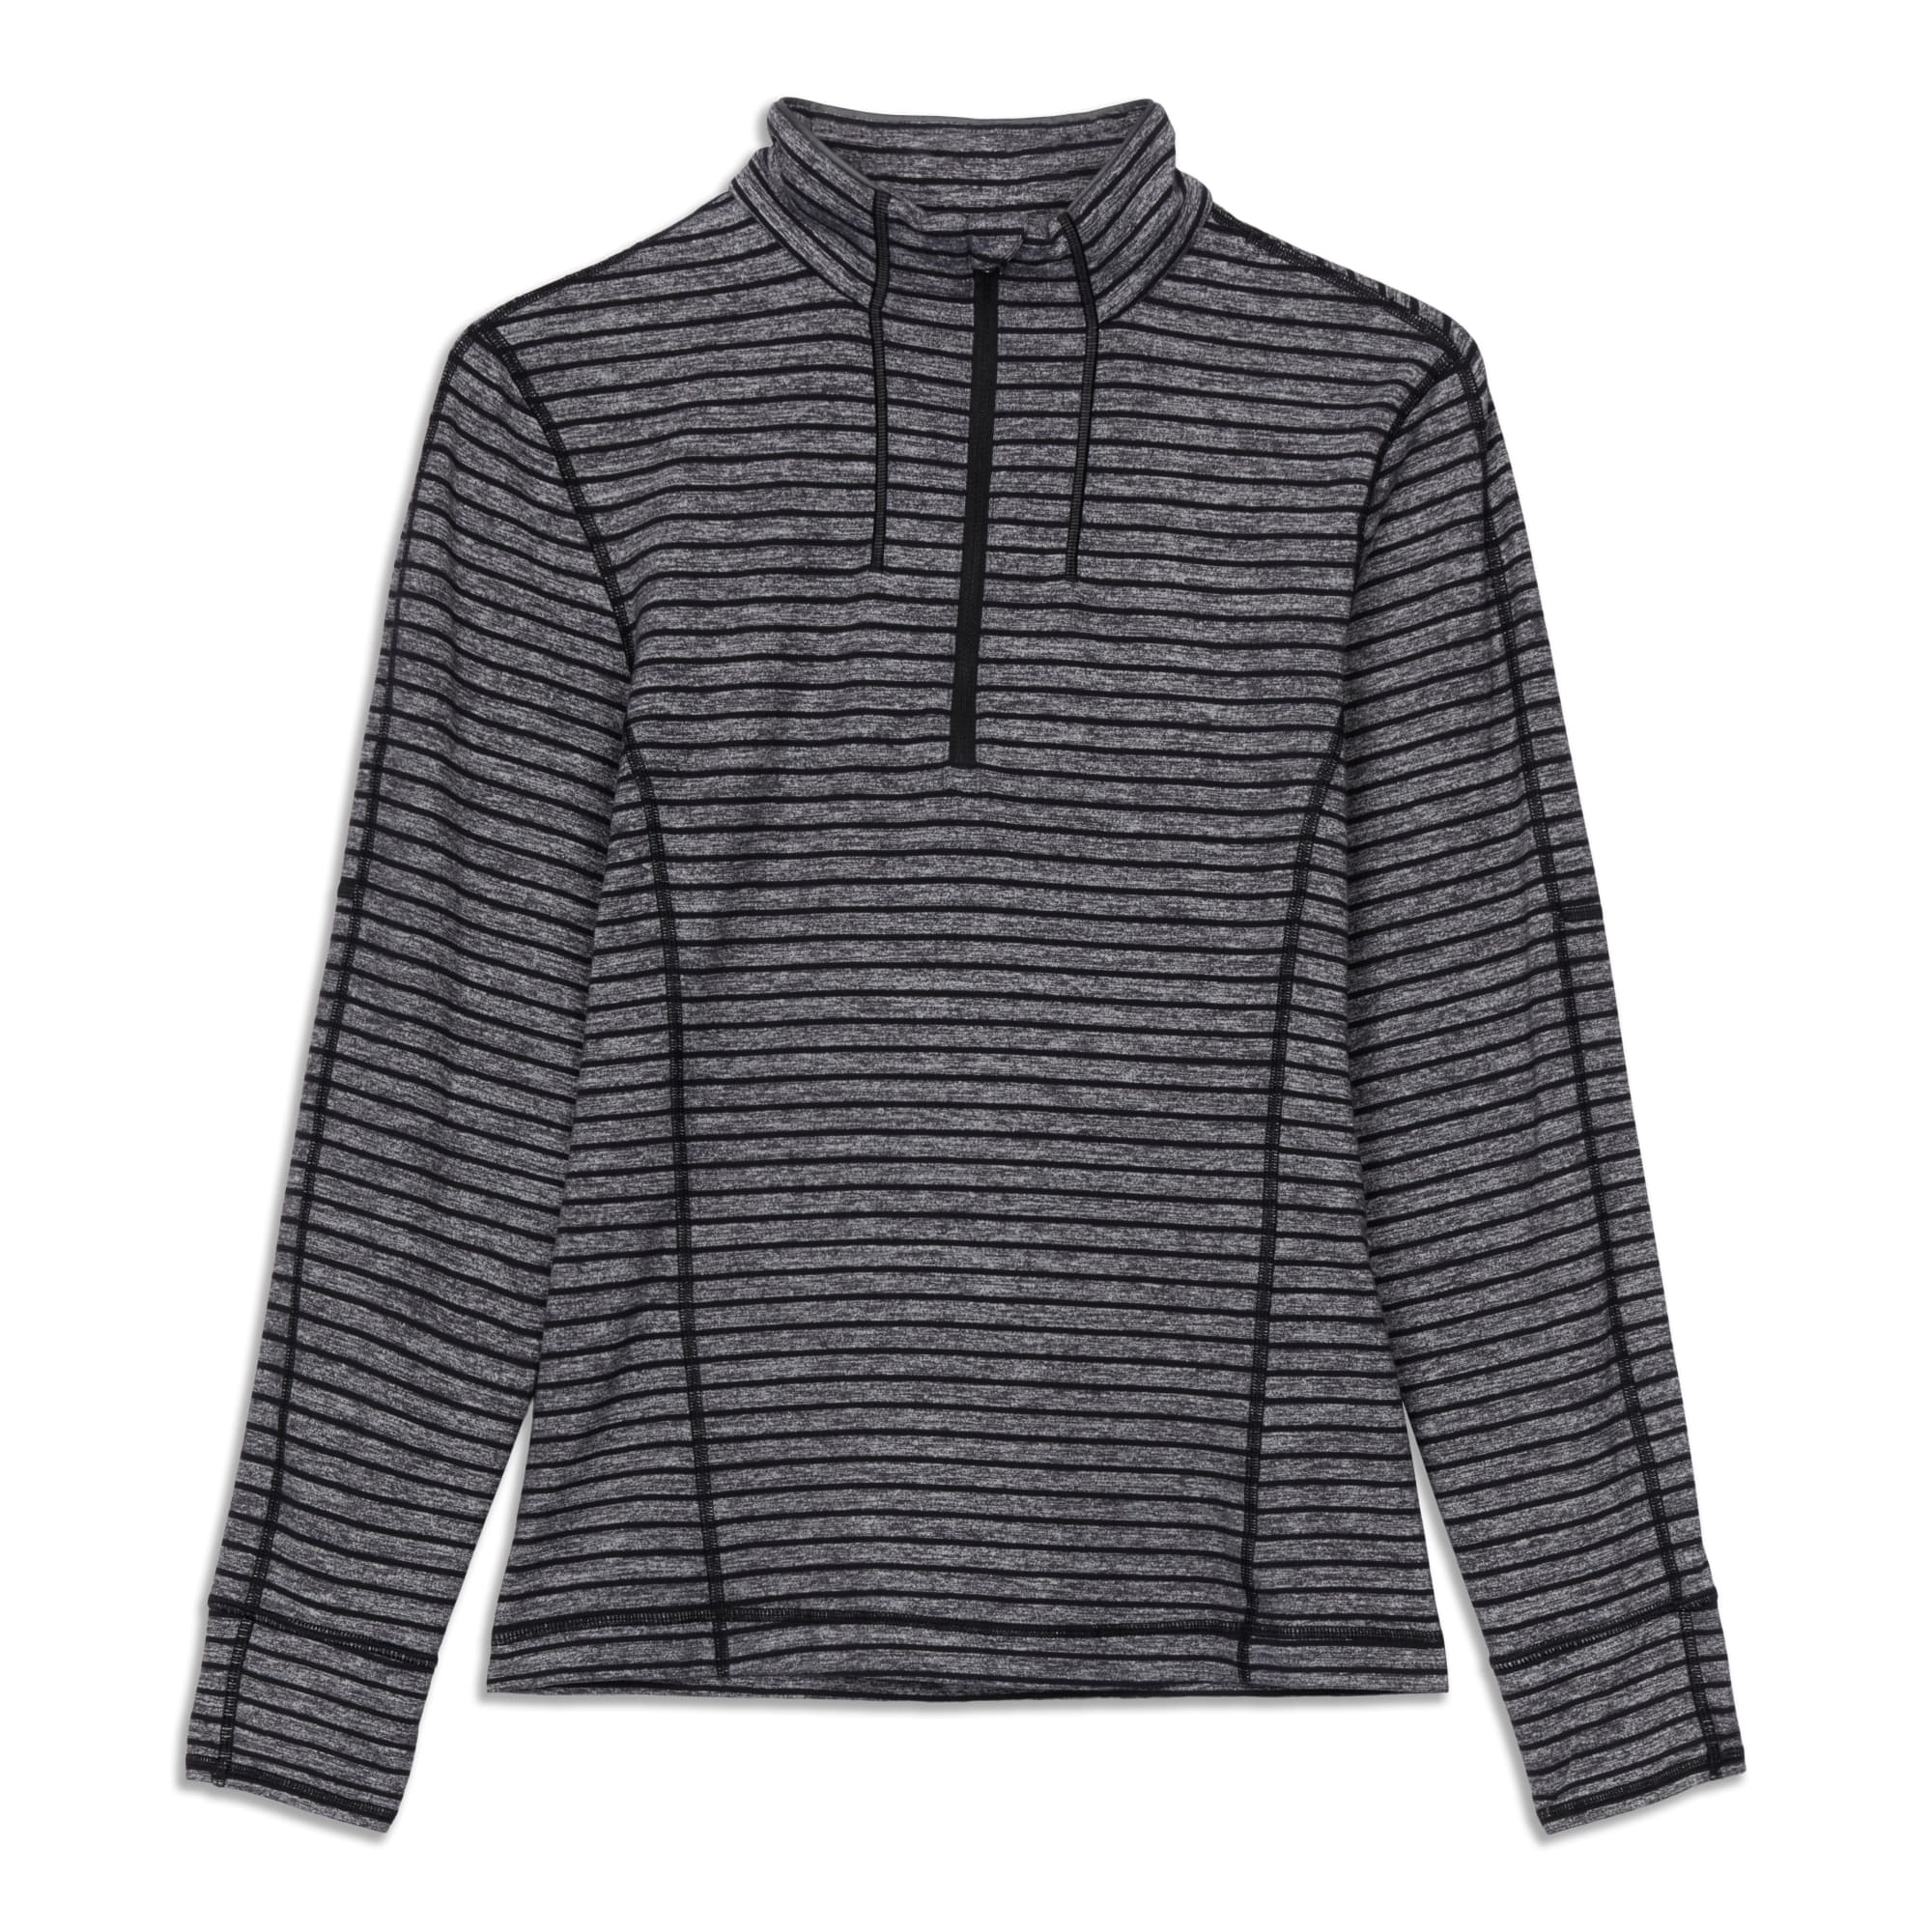 Main product image: Men's 1/2 Zip Pullover - Resale